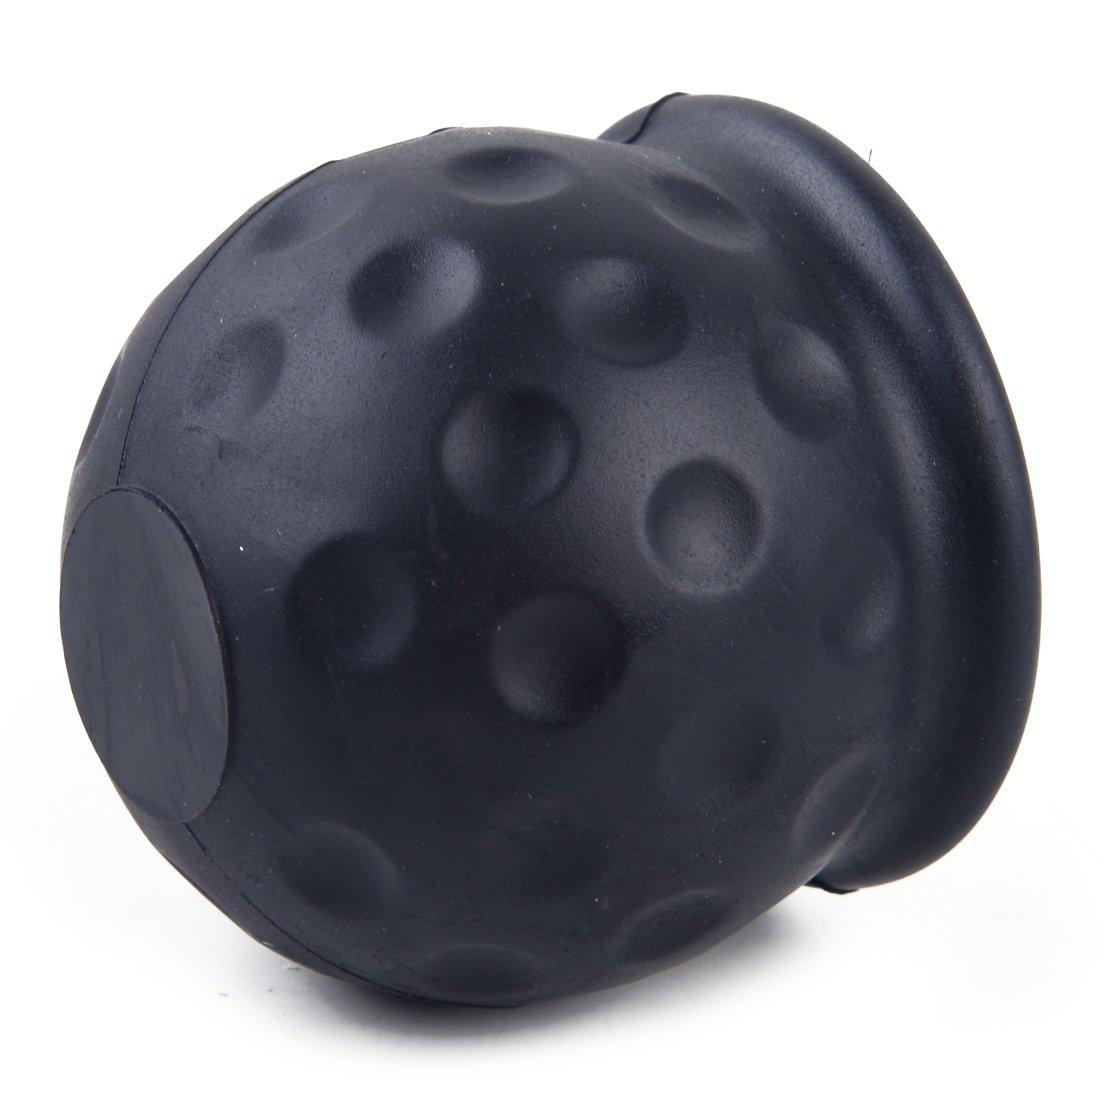 beler Car Rubber Black 50mm Tow Ball Towball Protector Cover Cap Hitch Caravan Trailer hermeshine